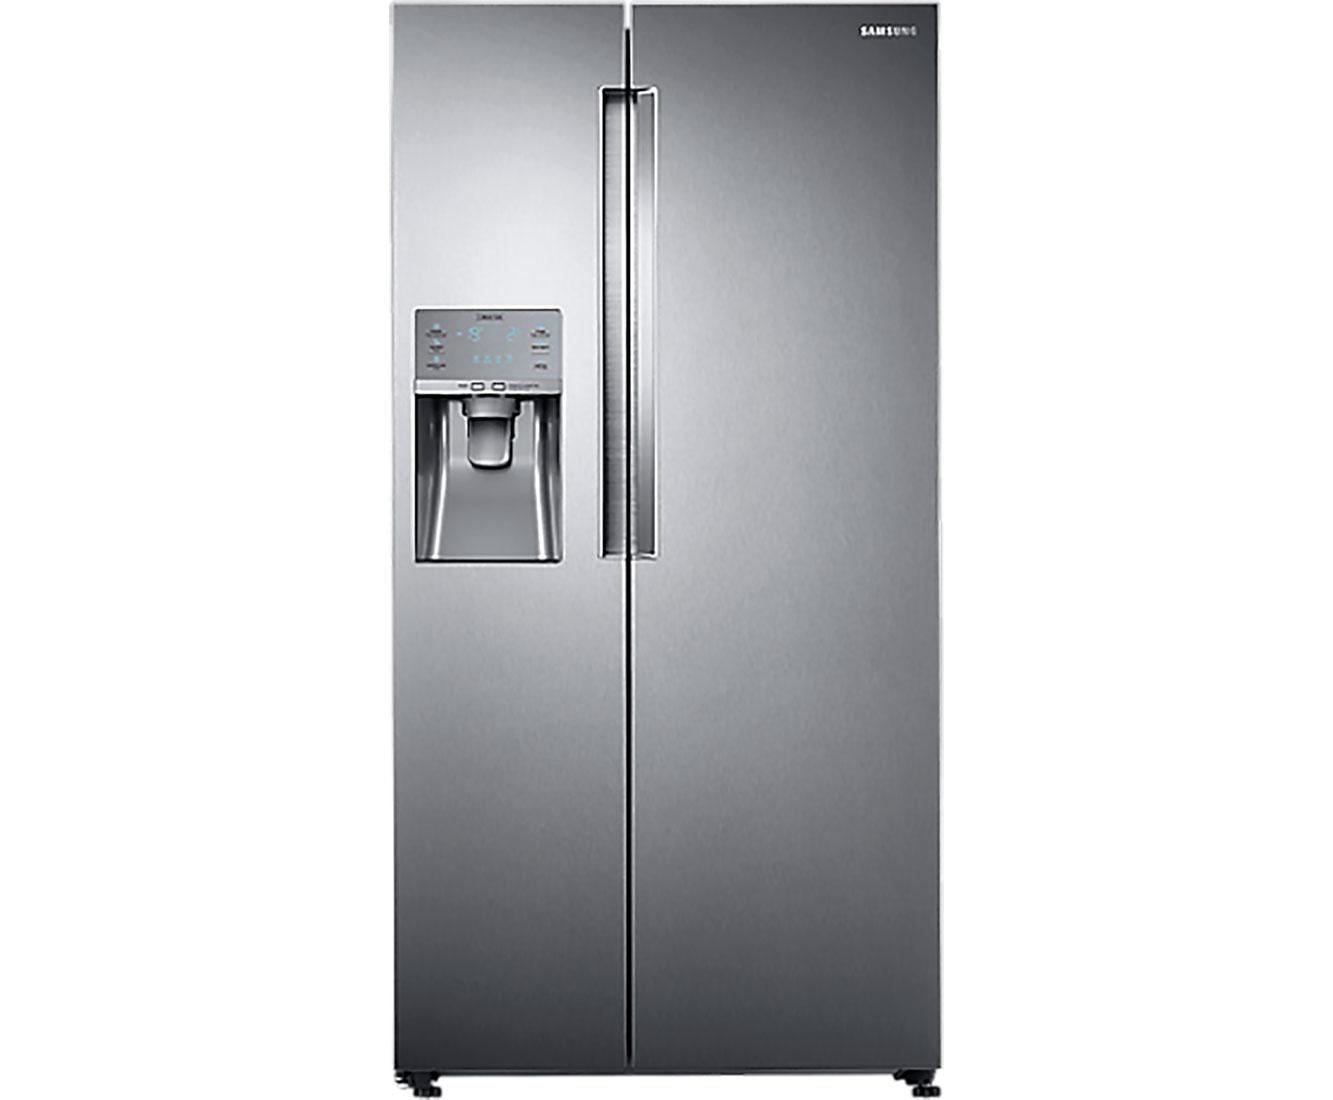 Amerikanischer Kühlschrank Edelstahl : Samsung rs fk sl eg side by side freistehend edelstahl ebay